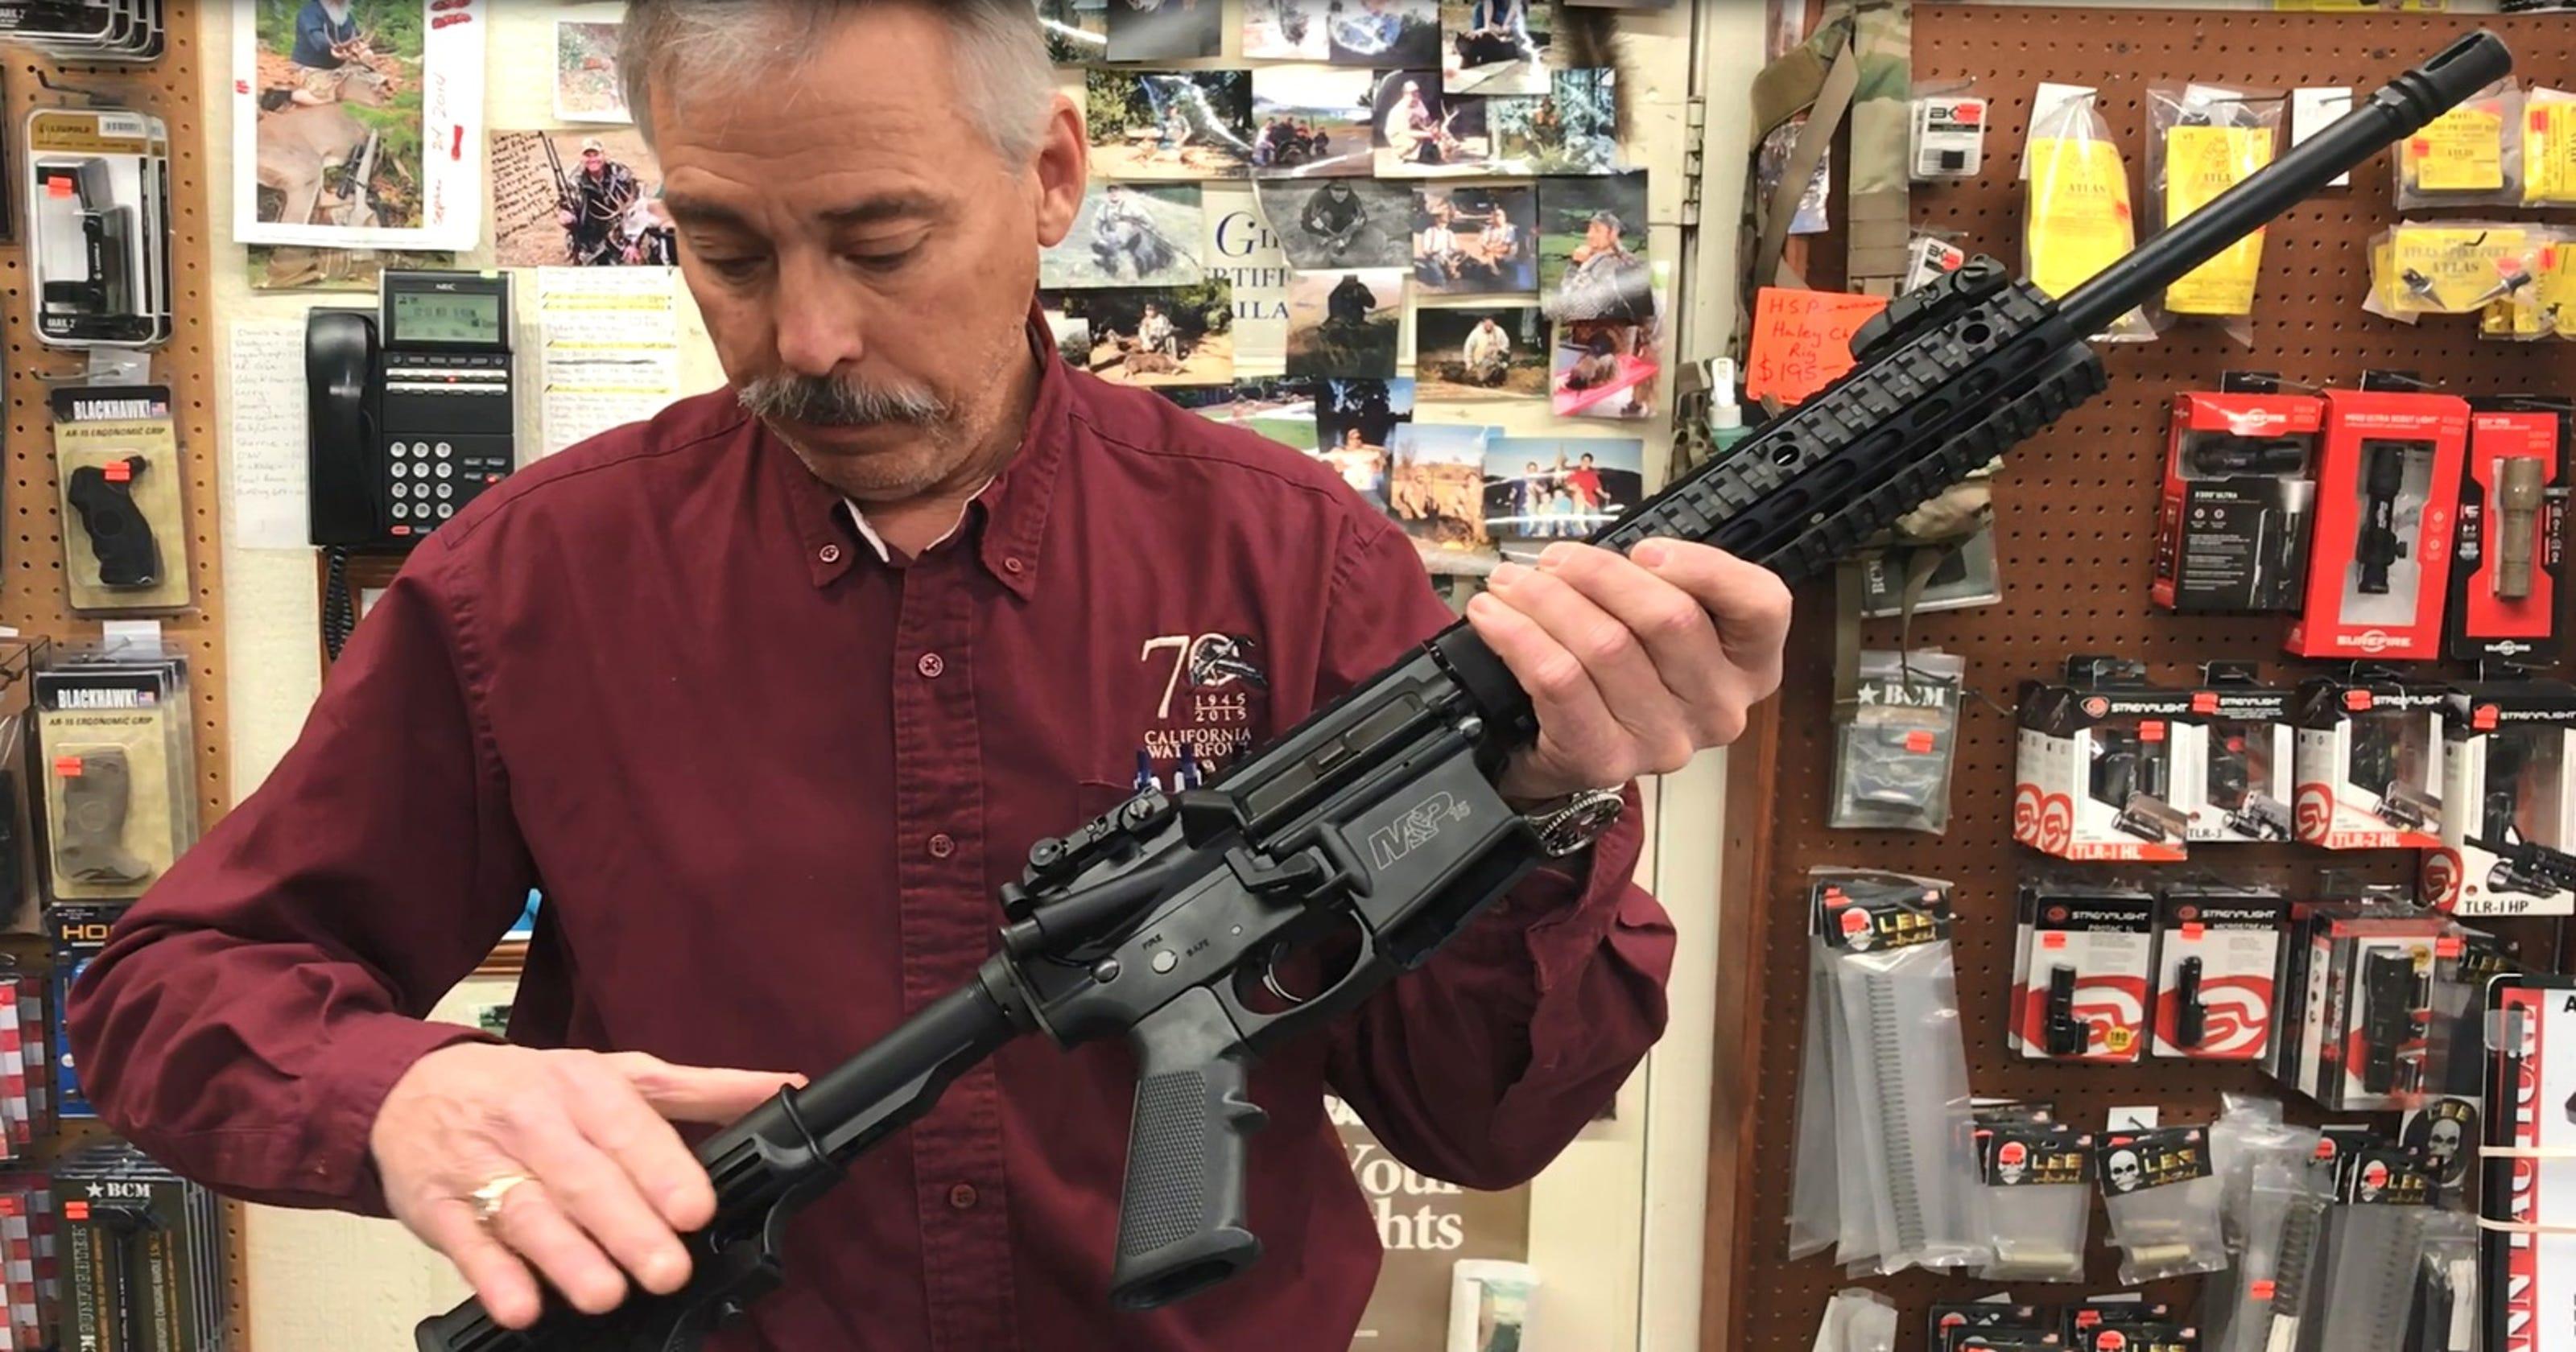 Ways to work around new California gun laws taking effect in